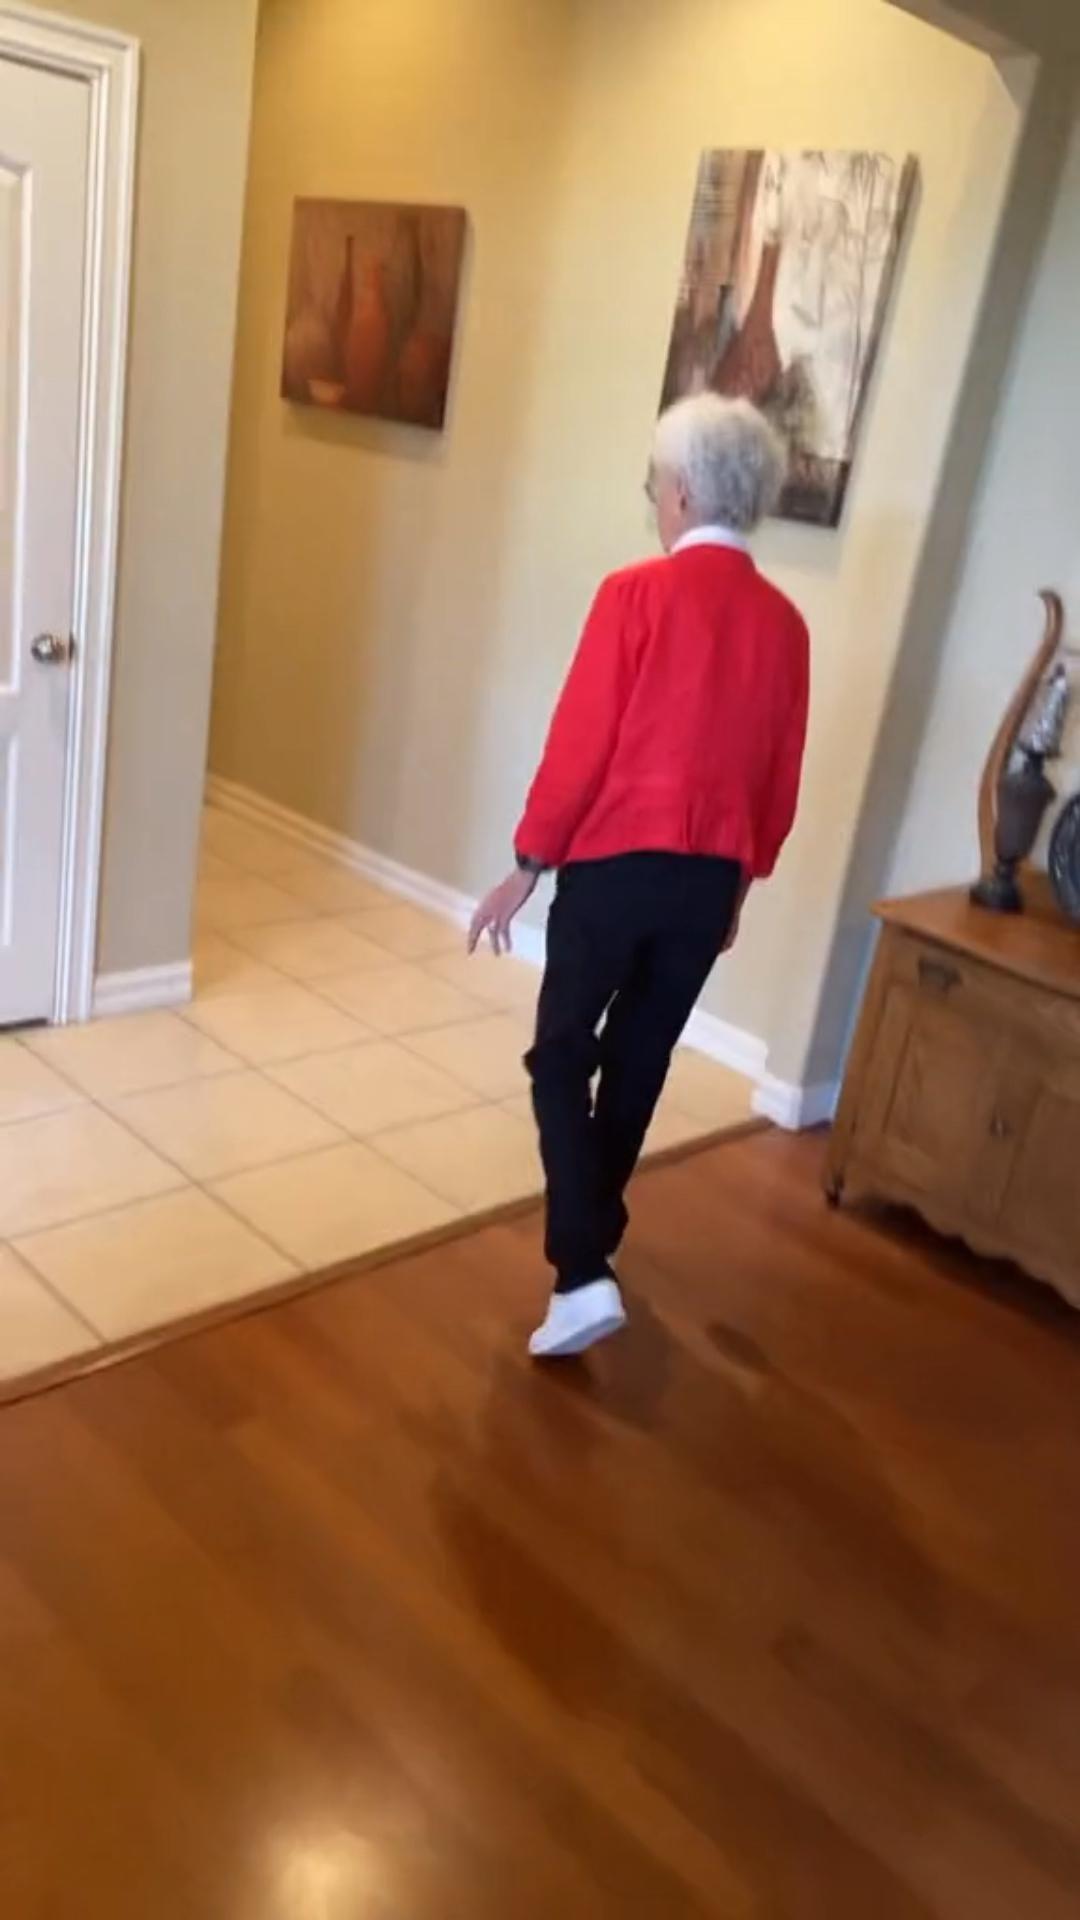 She's Fast!